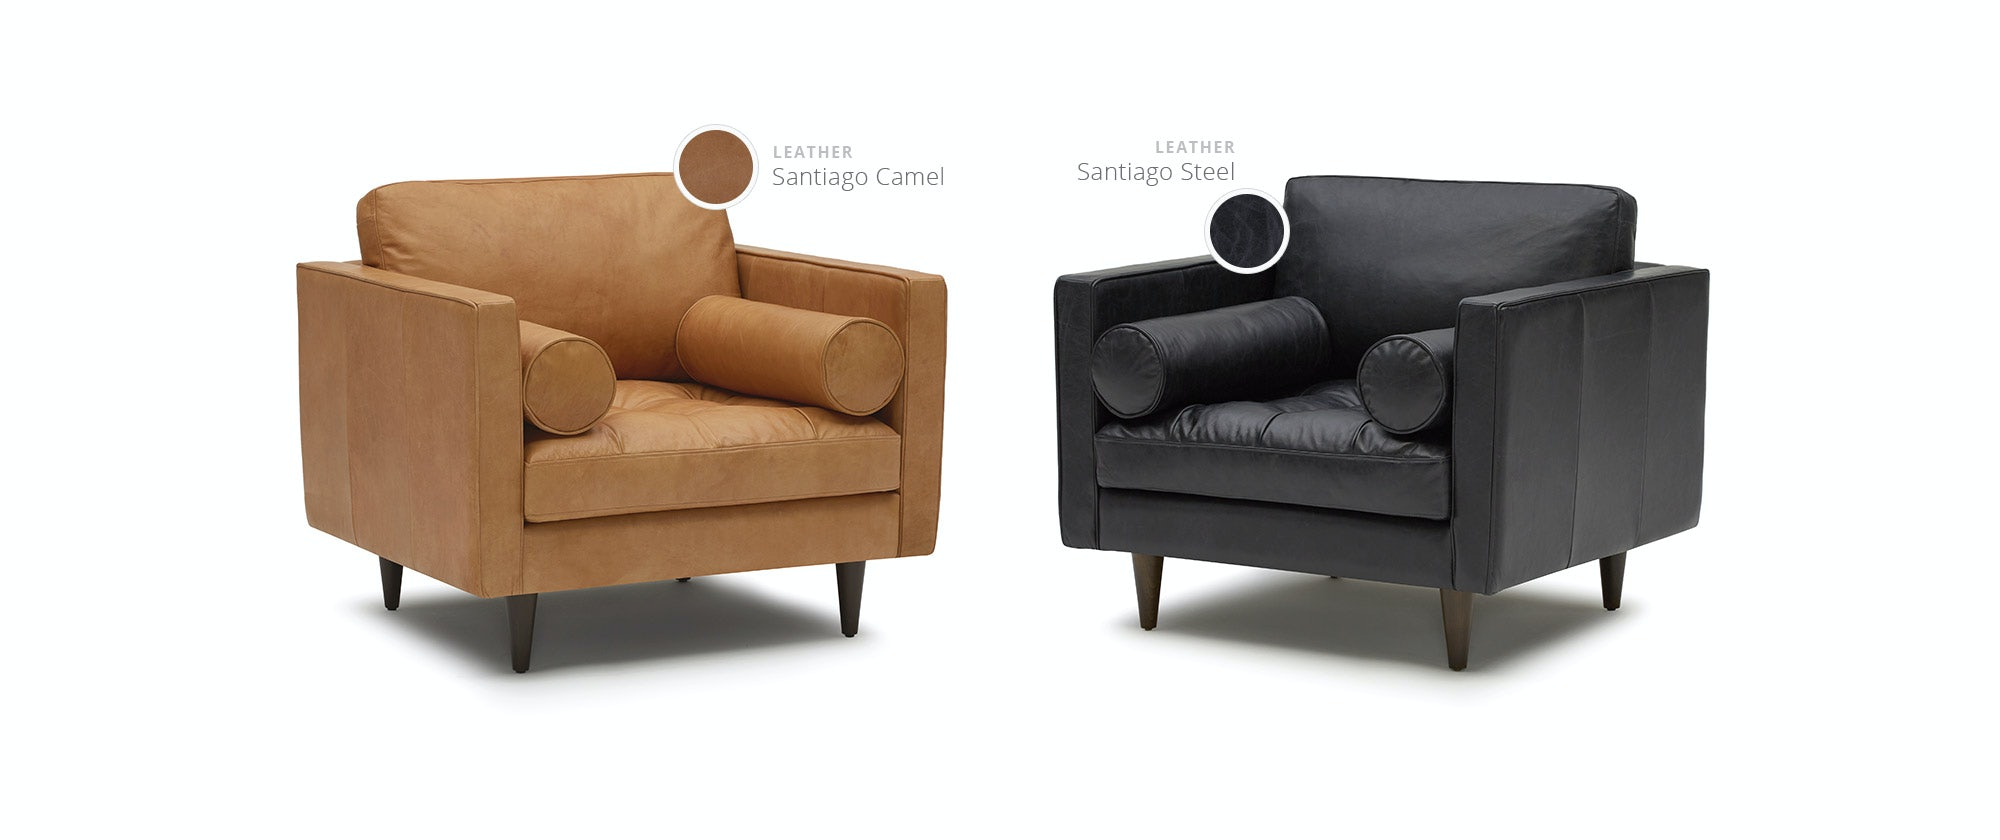 Astonishing Briar Leather Chair Beatyapartments Chair Design Images Beatyapartmentscom